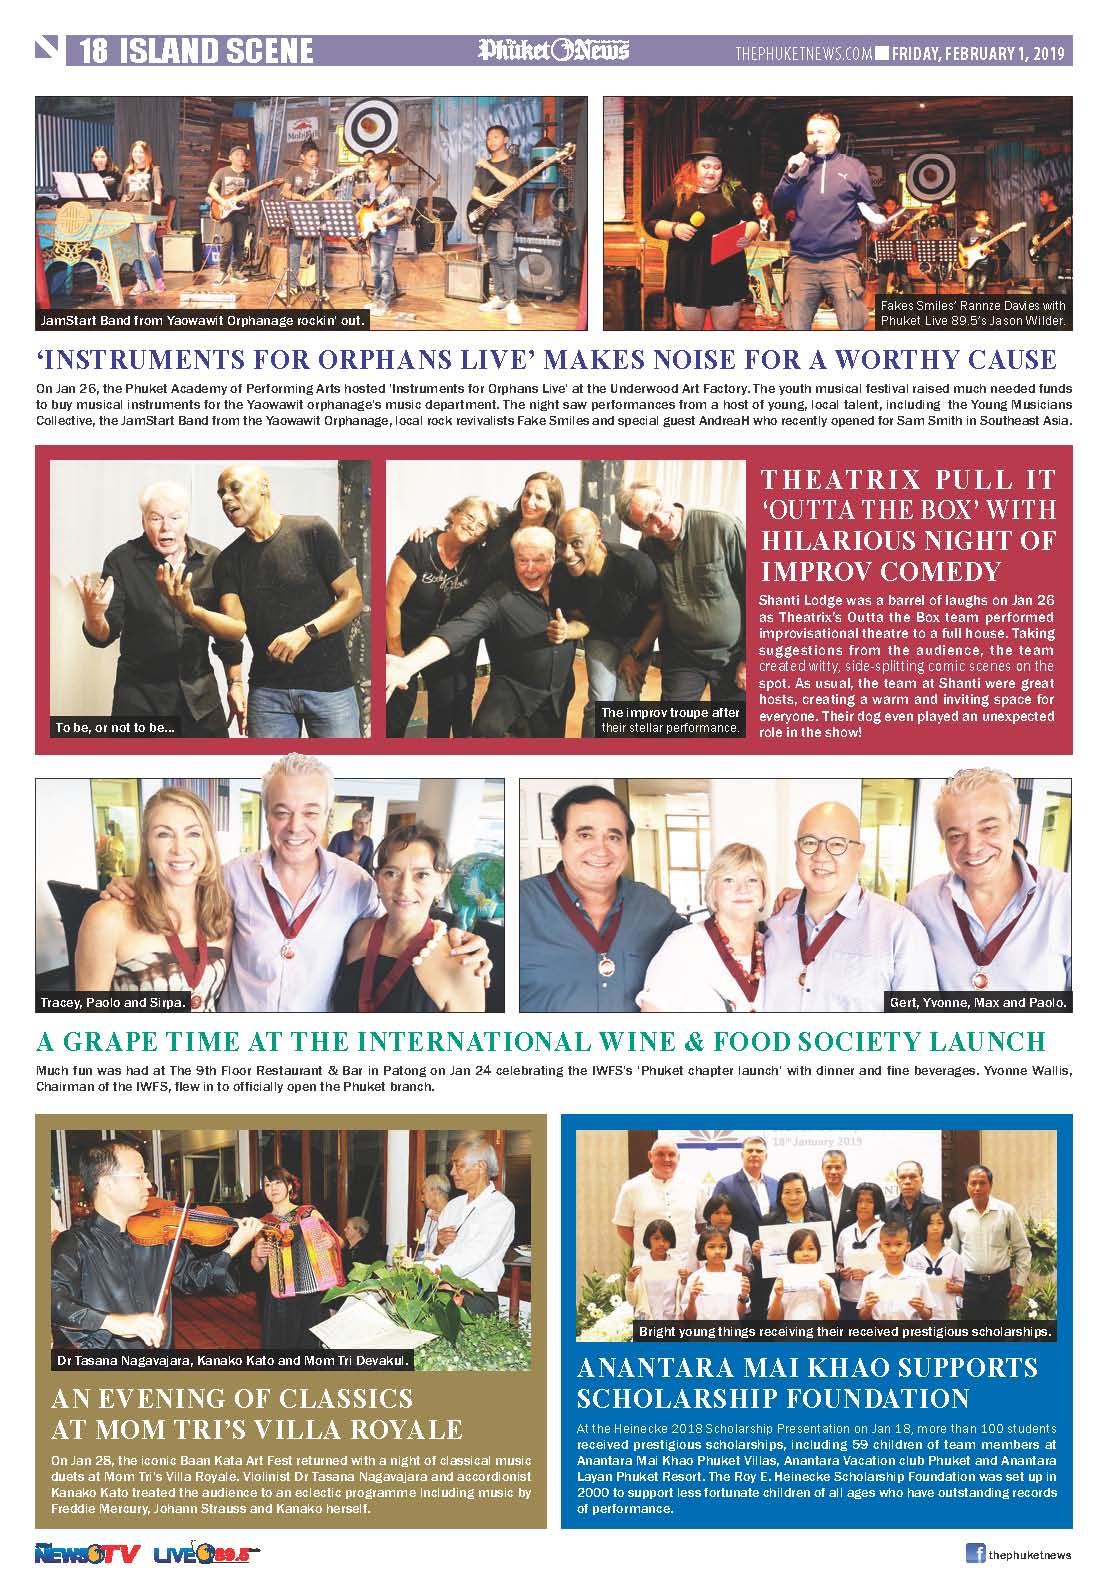 https://www.thephuketnews.com/archive/01-02-2019/01-02-2019_Page_18.jpg | Phuket Newspaper - 01-02-2019 Page 18